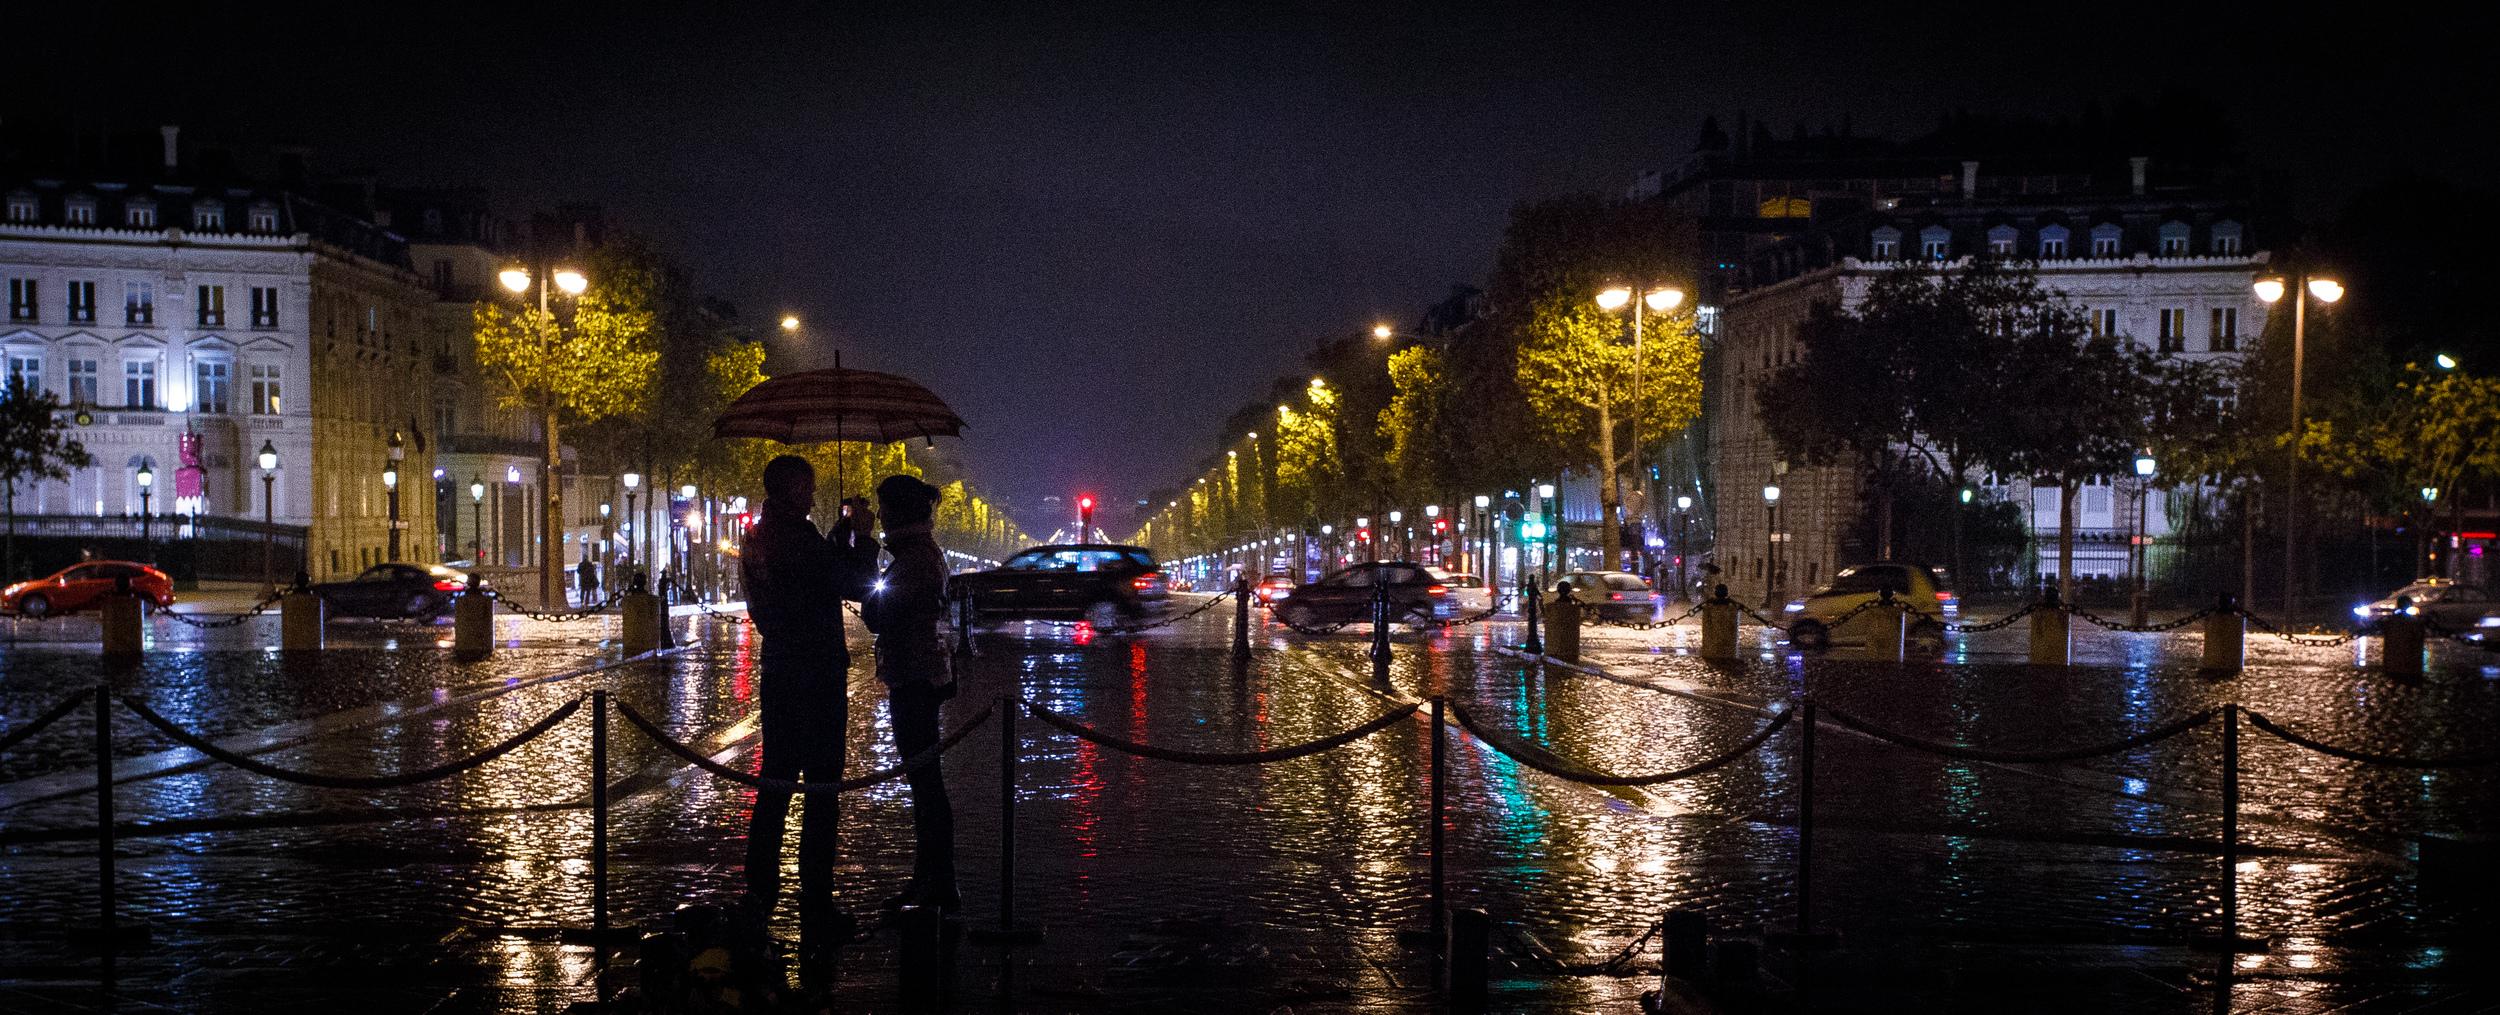 paris-2013 - 20131103 - 1379.jpg